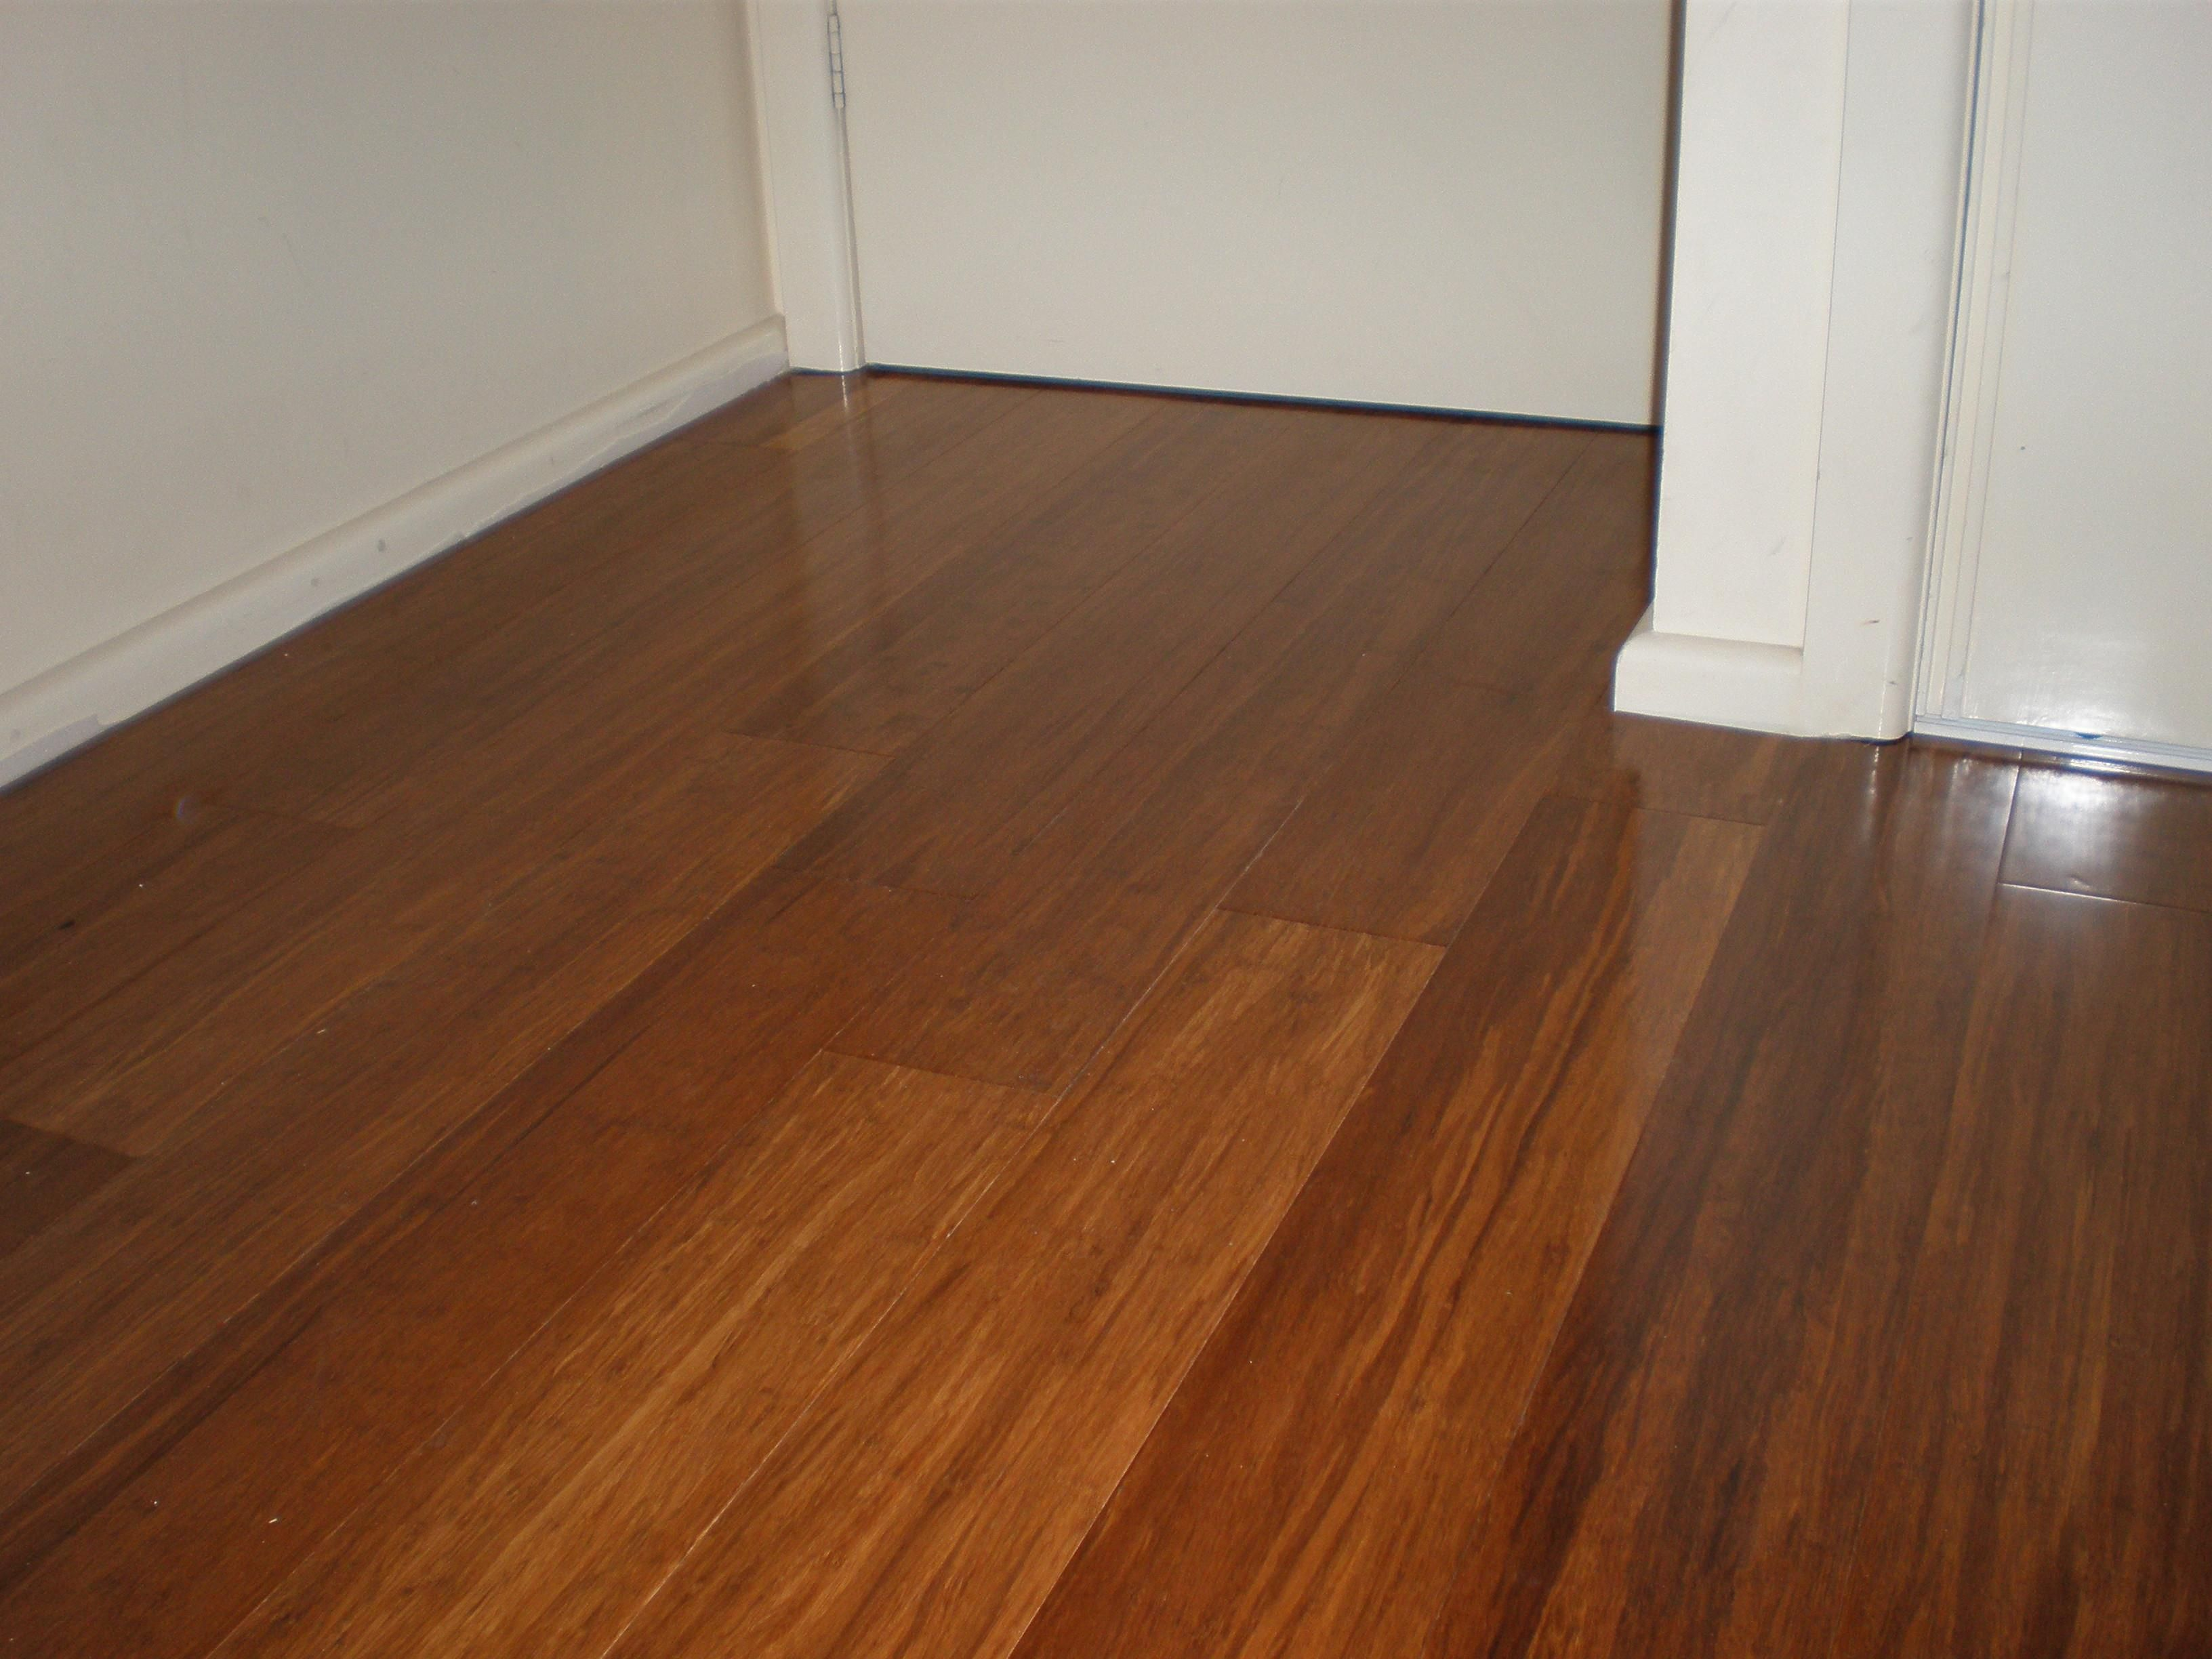 bamboo flooring installation flooring refinishing services. Black Bedroom Furniture Sets. Home Design Ideas